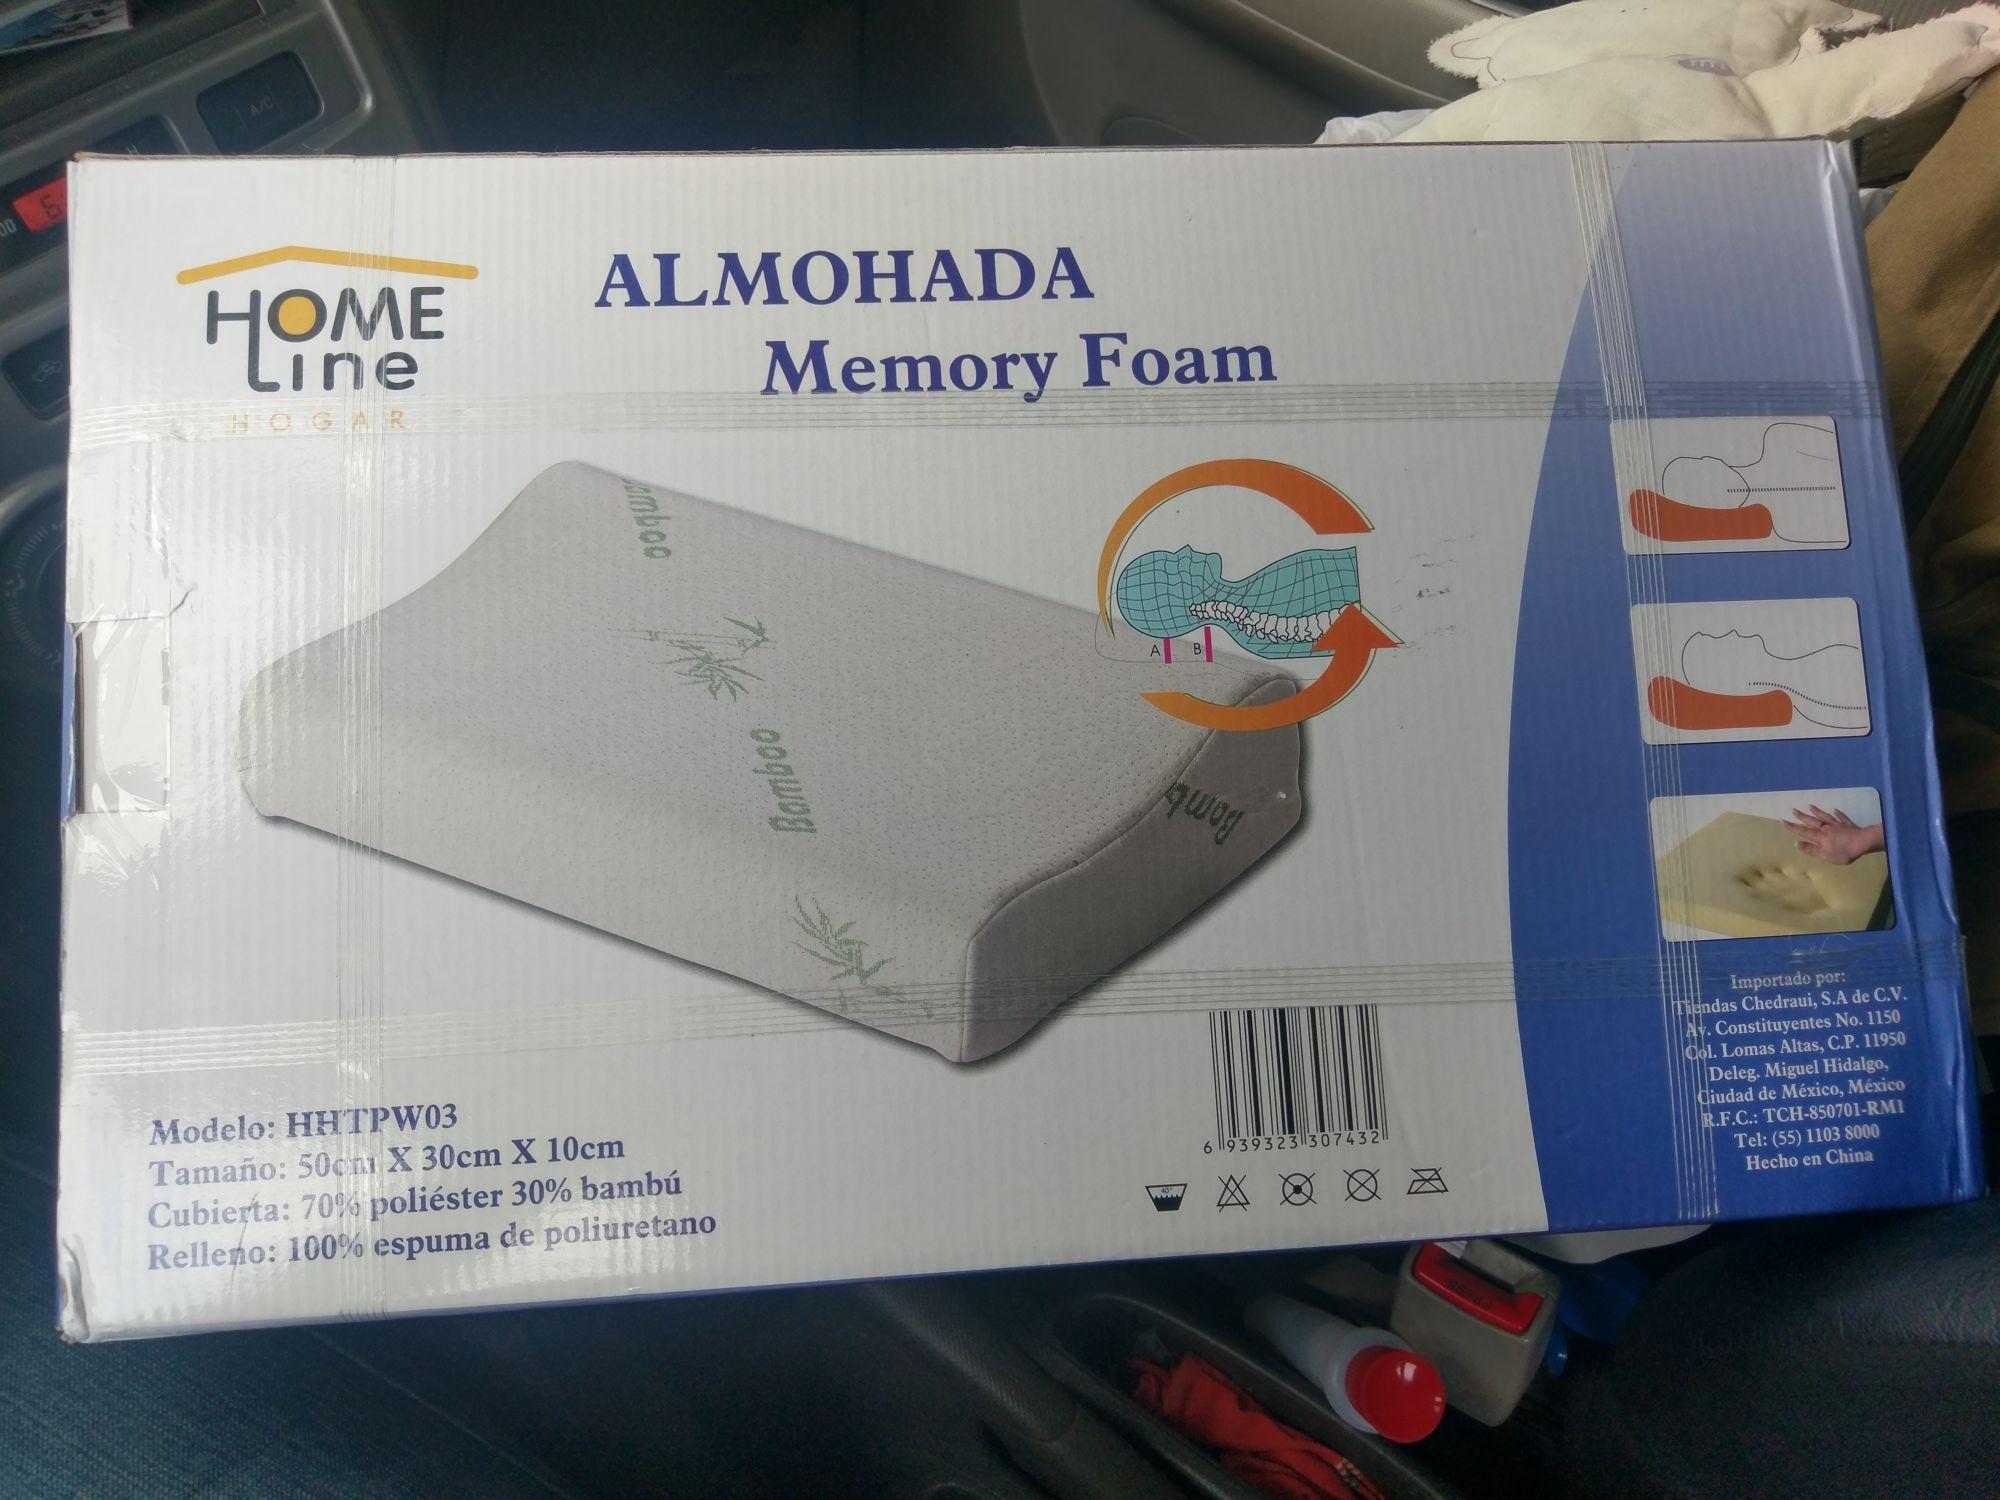 Chedraui: Almohada Memory Foam  Home Line